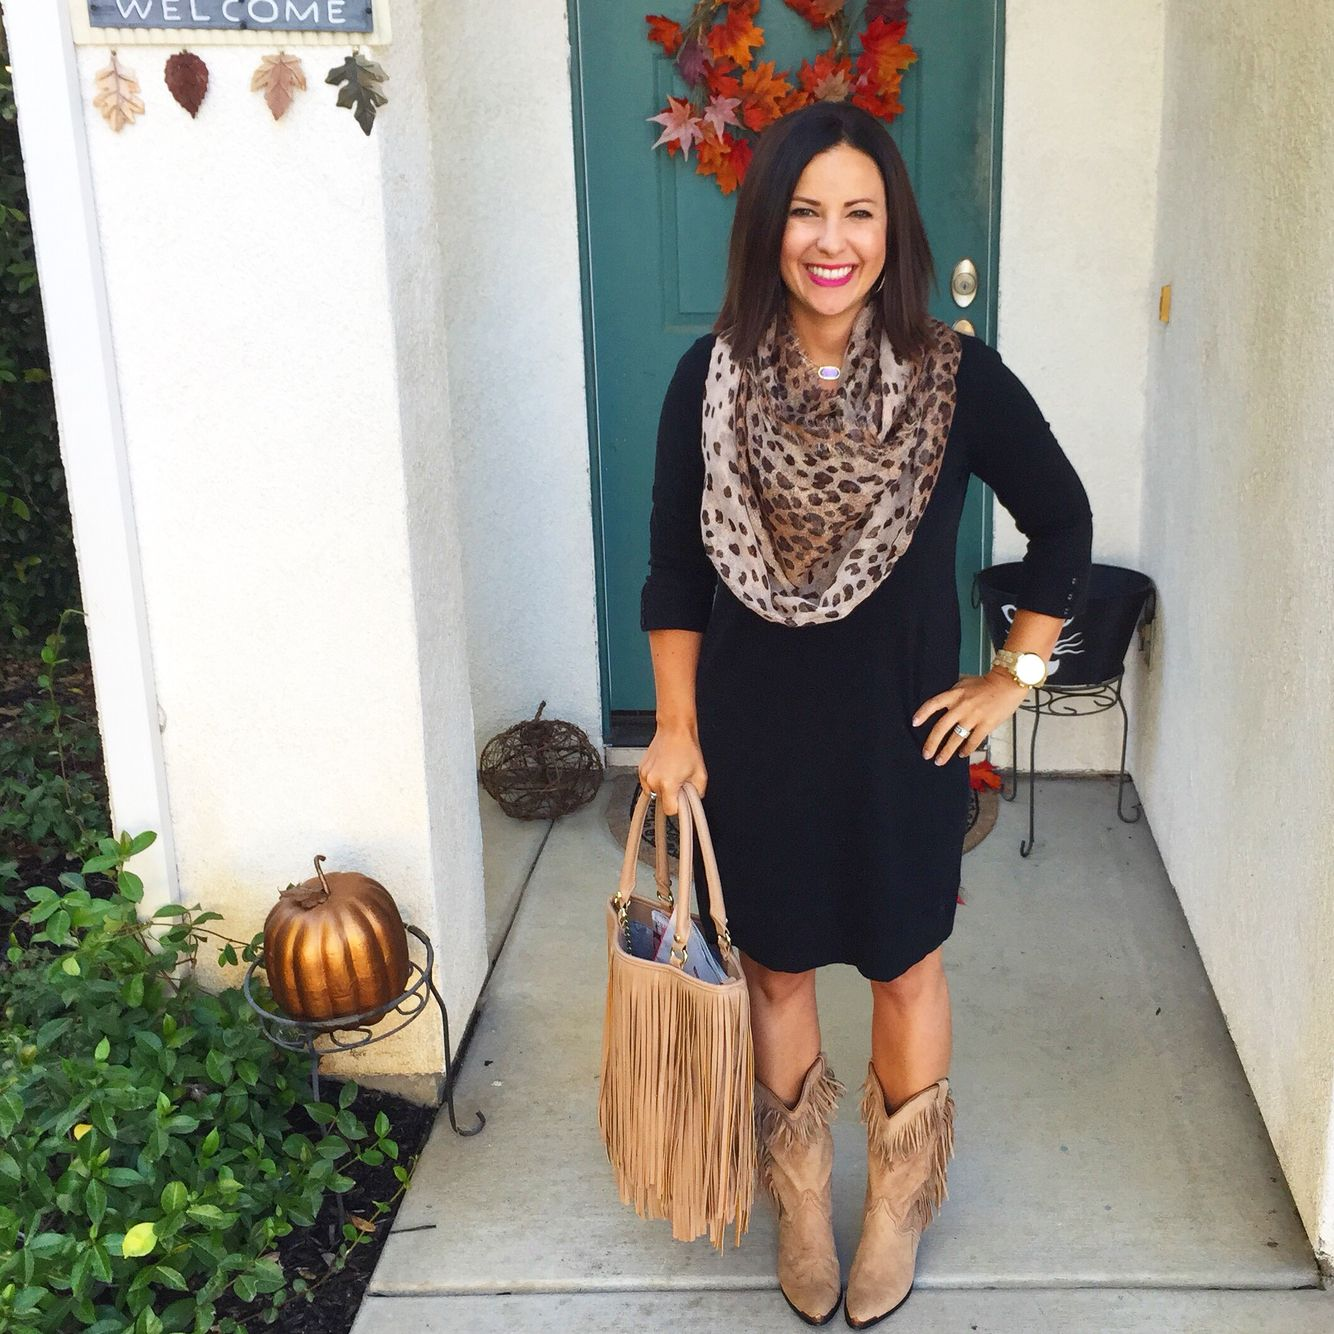 Teacher Outfit Fall Style Lbd Black Dress Leopard Scarf Ootd Fringe Boots Fringe Purse Autumn Fashion Spring Teacher Outfits Fall Outfits [ 1334 x 1334 Pixel ]